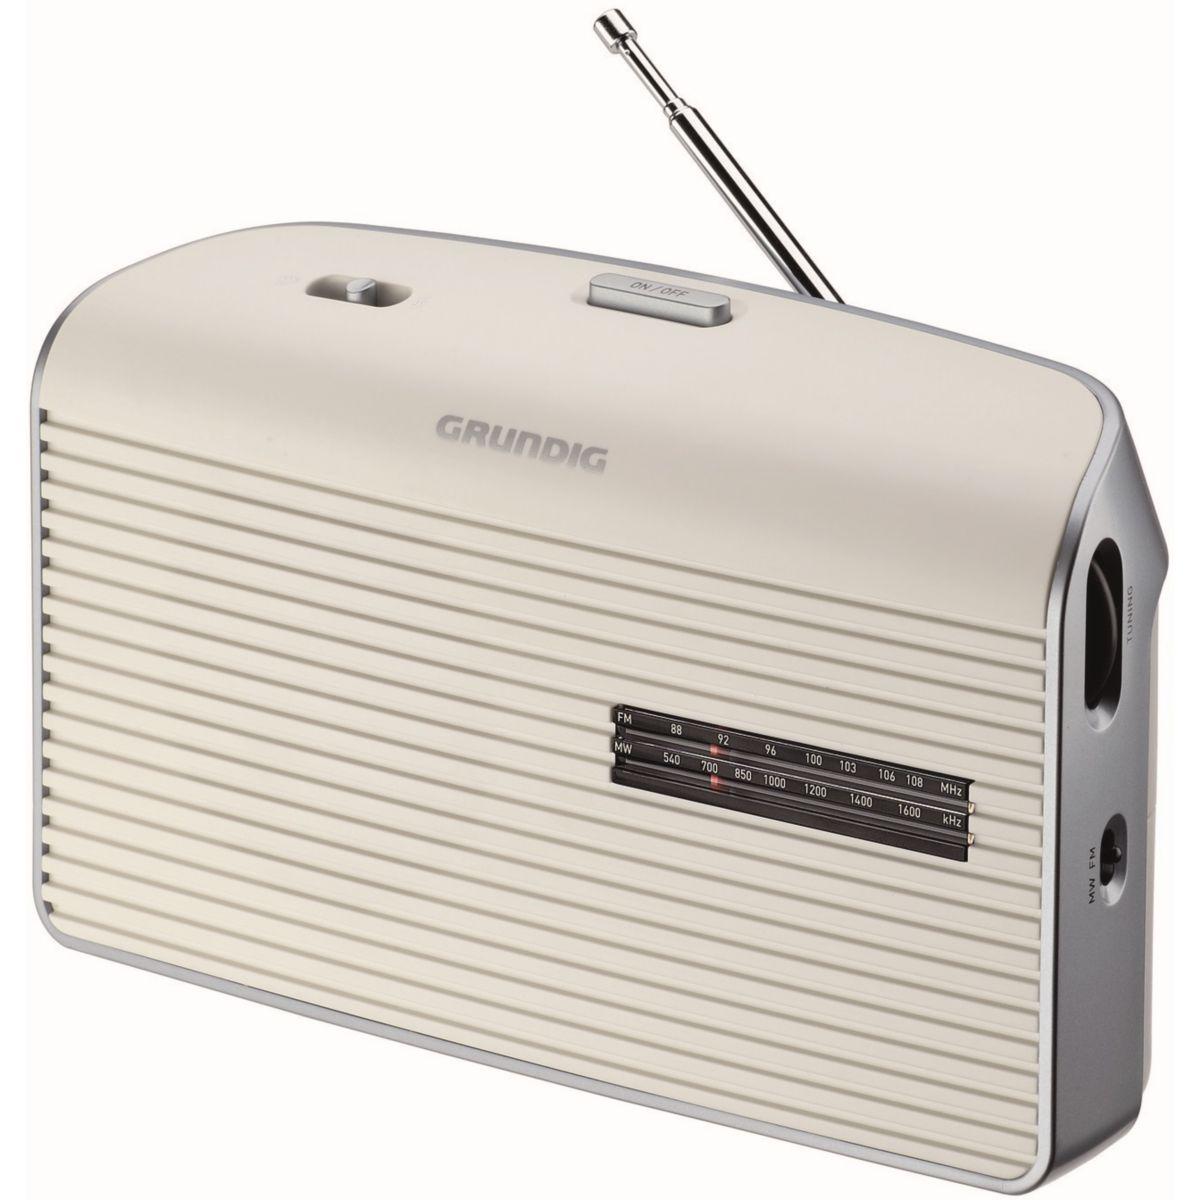 Radio grundig music 60 l blanc - livraison offerte : code liv (photo)